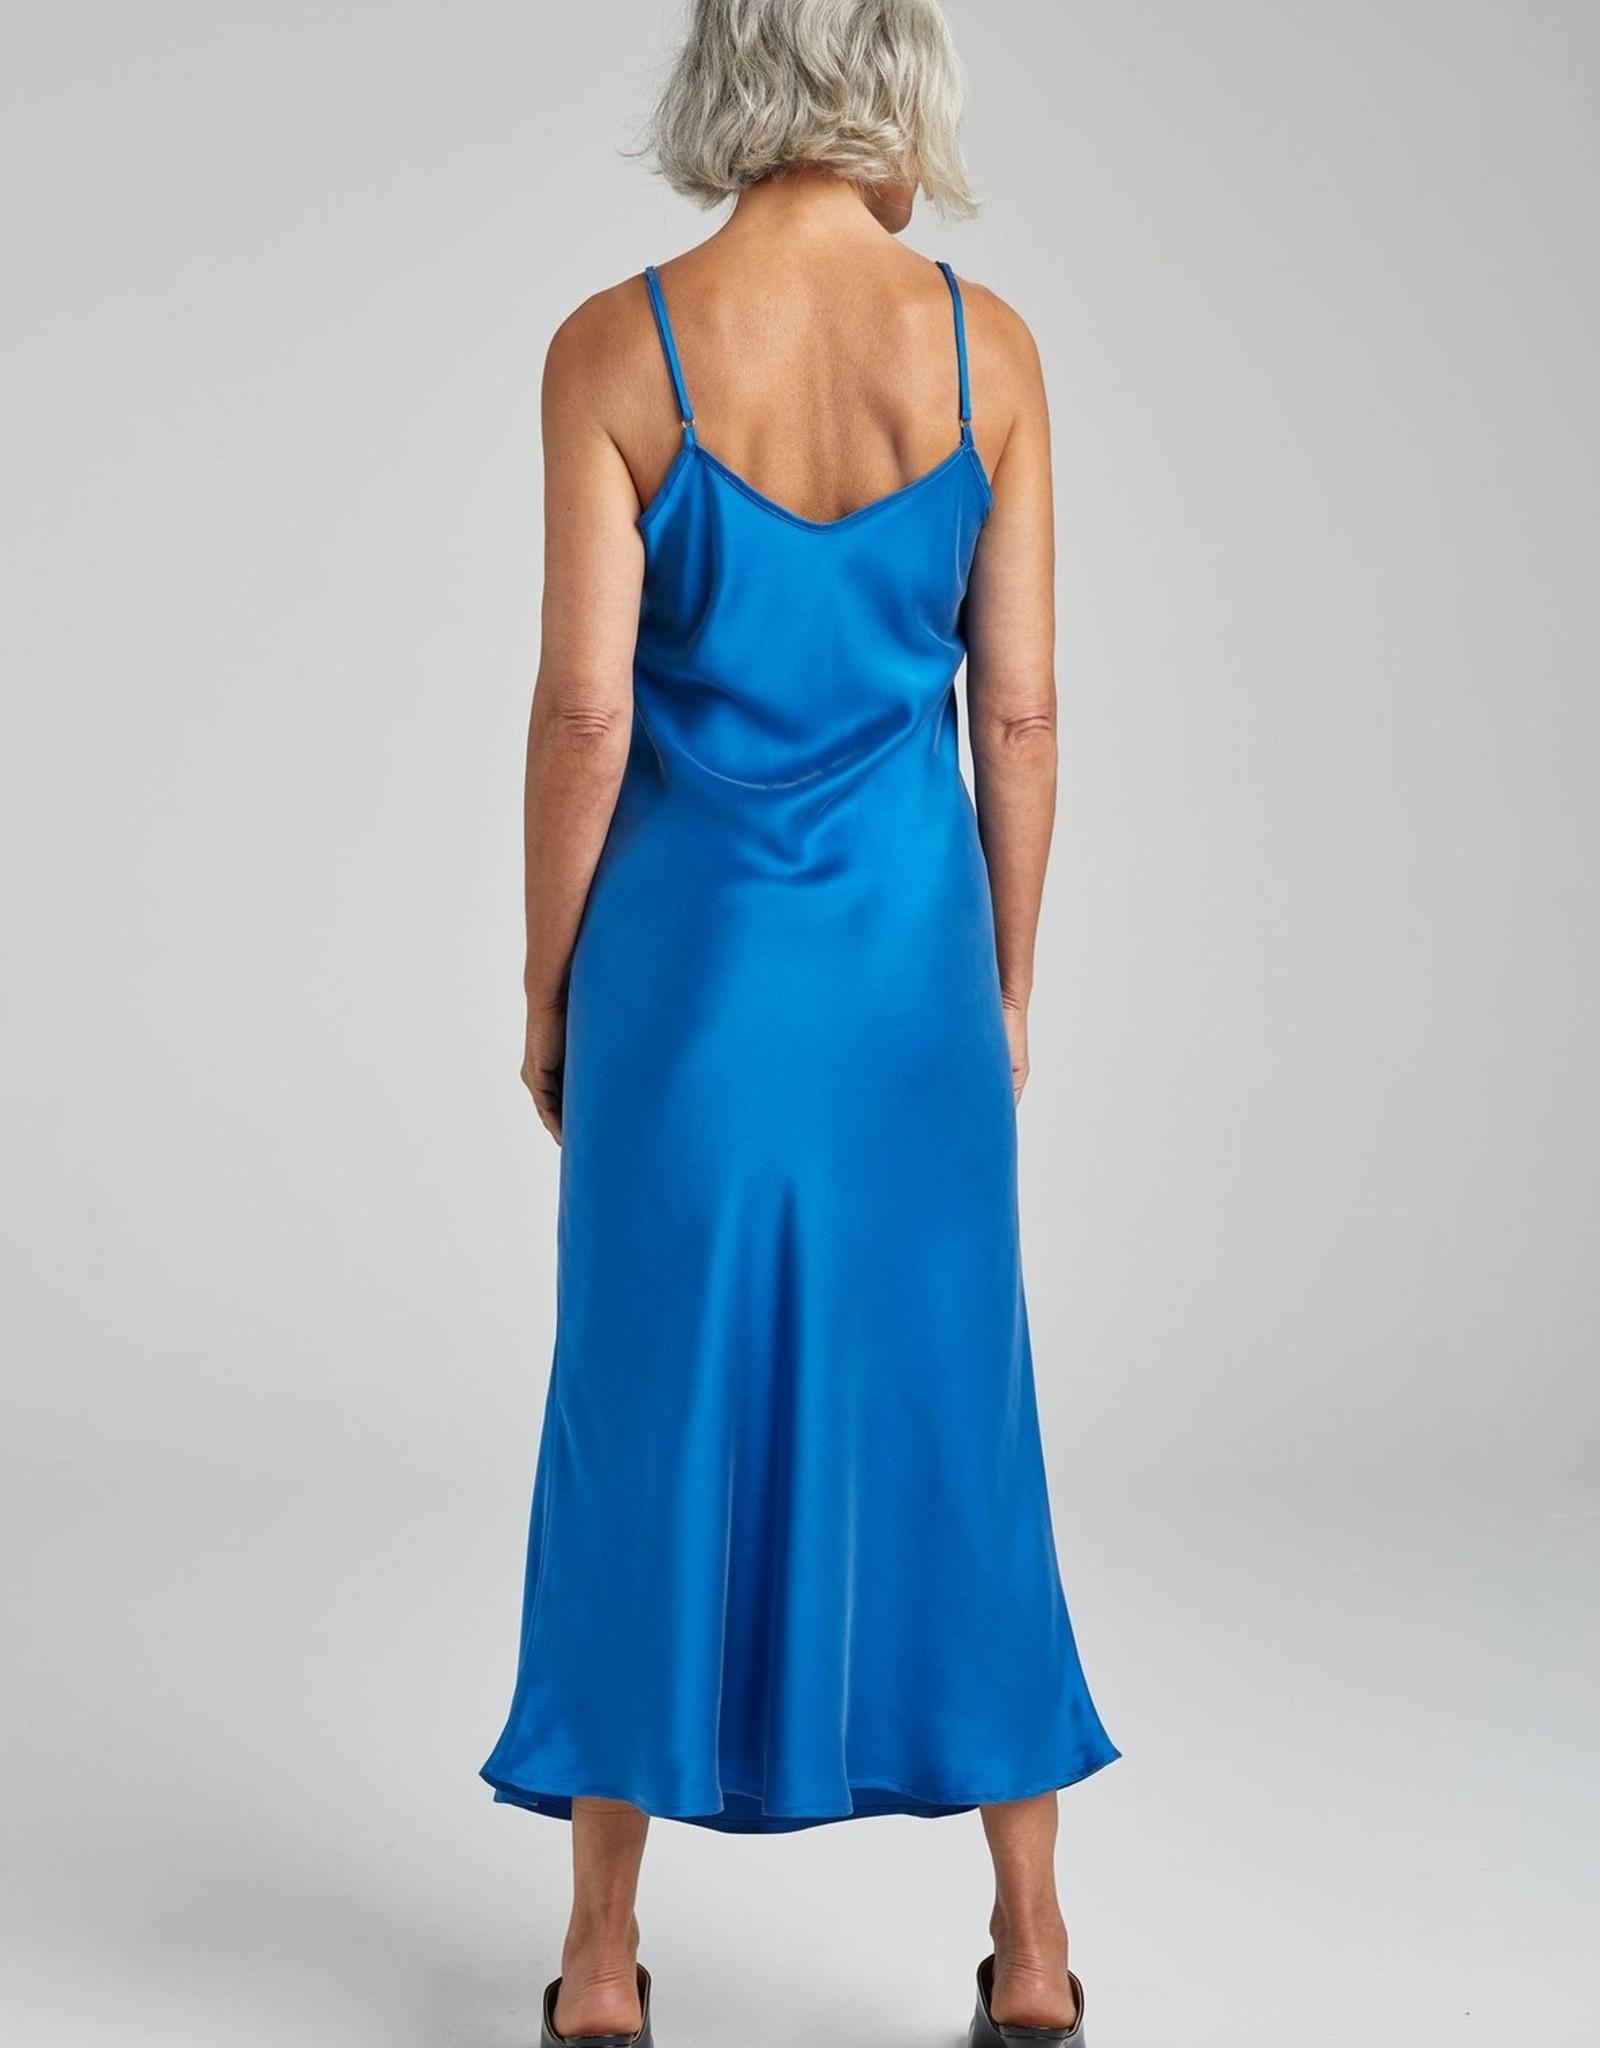 SILK LAUNDRY 90S SILK SLIP DRESS COBALT BLUE